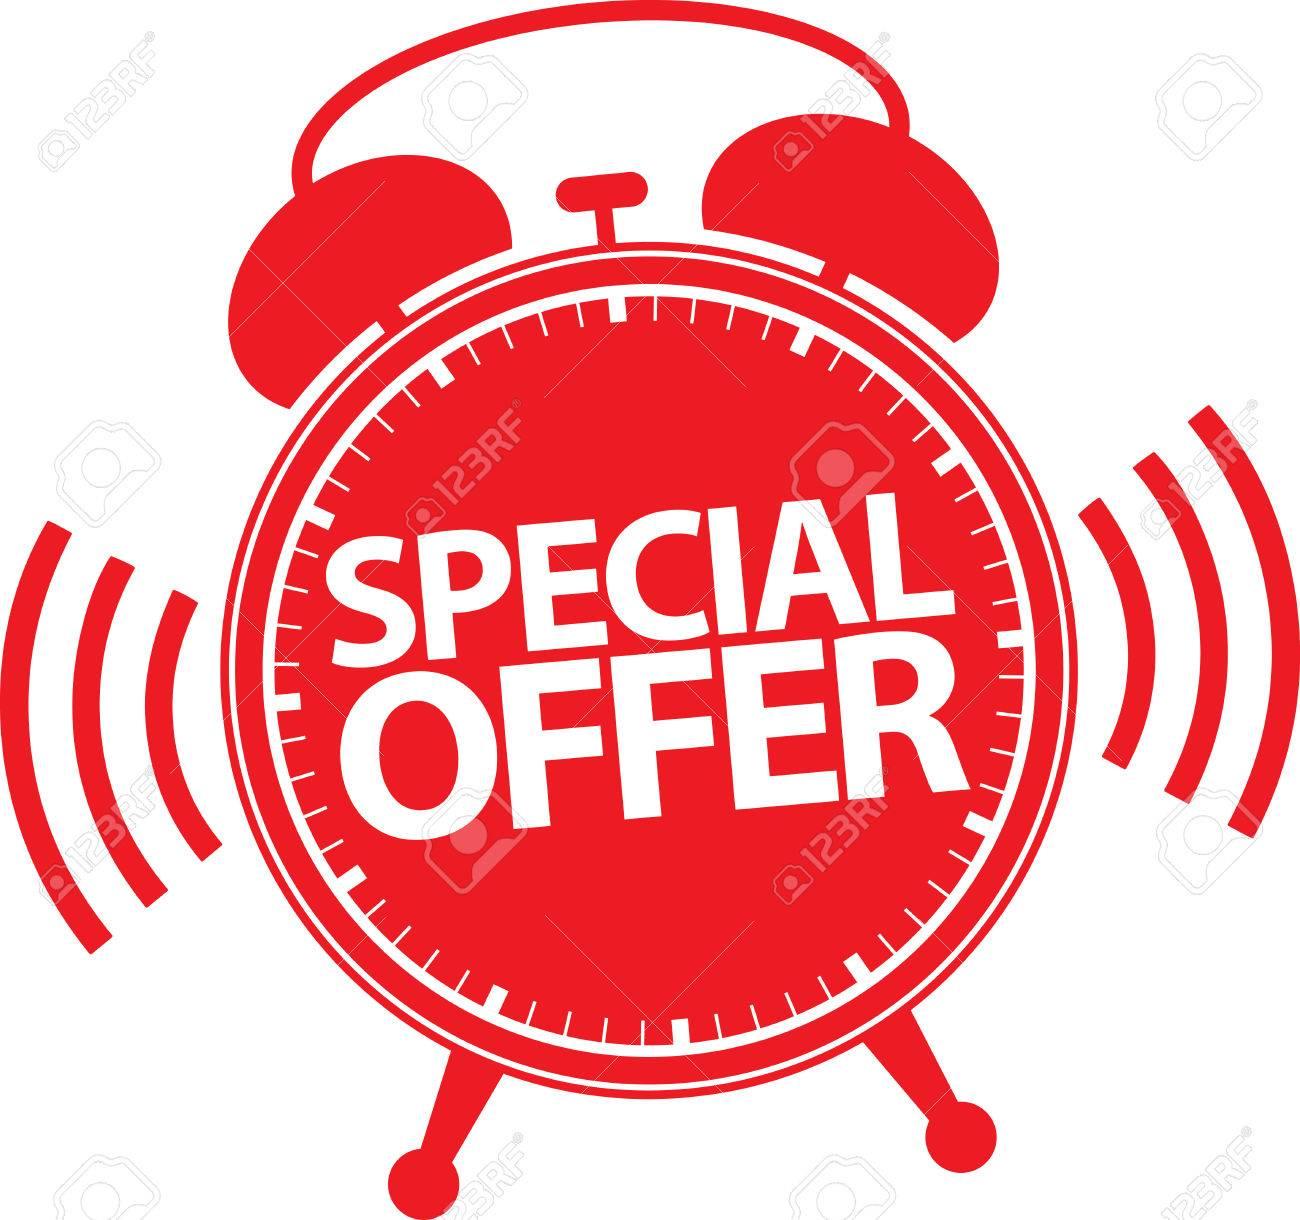 Special offer alarm clock icon, vector illustration - 50564798